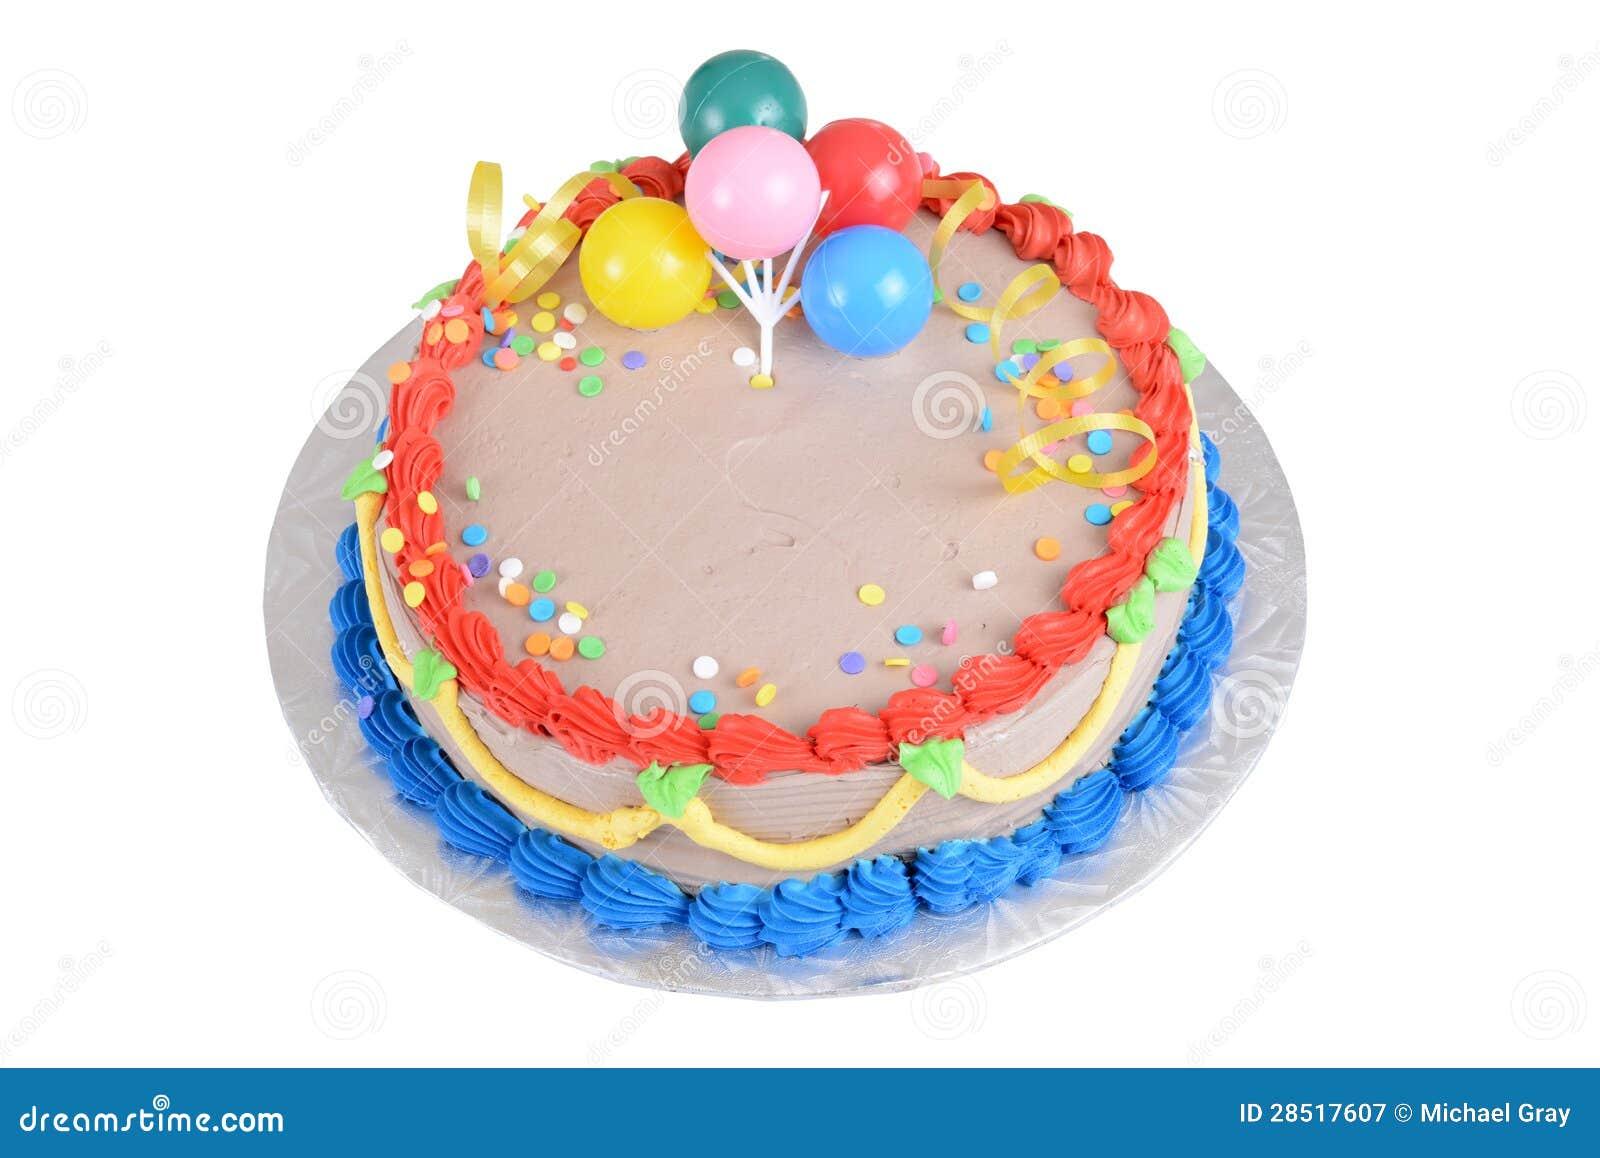 Top View Chocolate Birthday Cake Stock Image